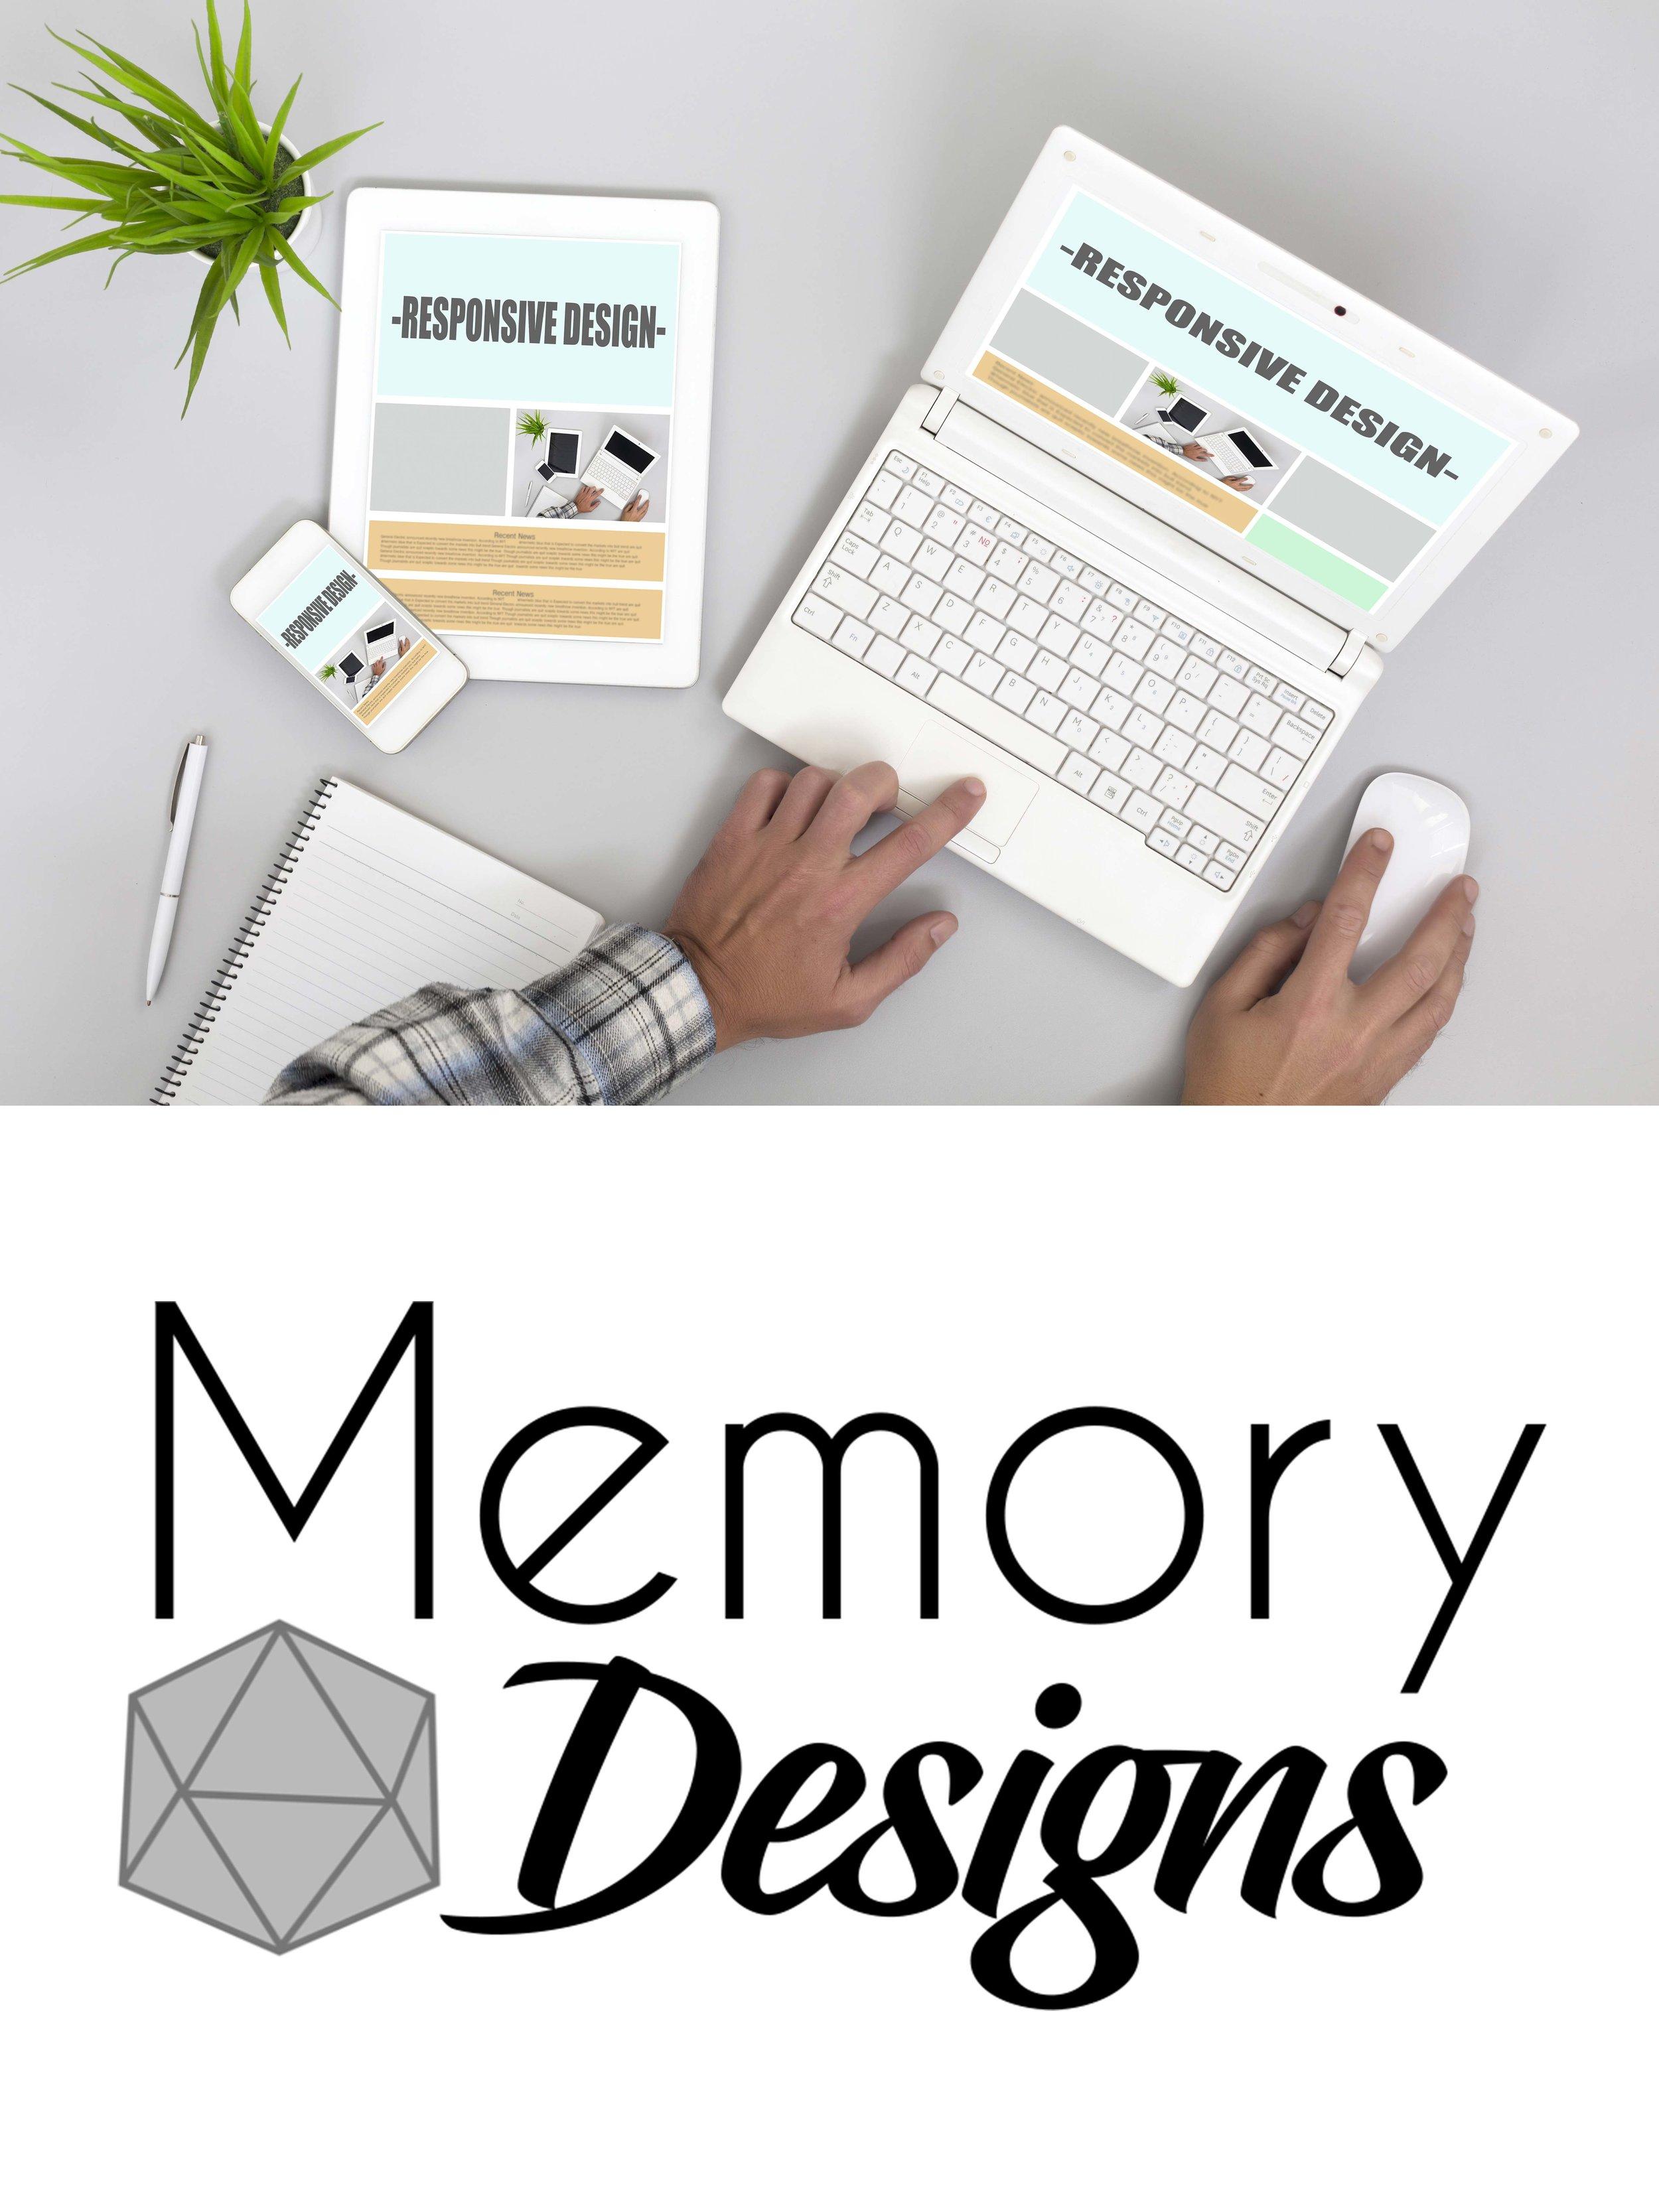 Memory Designs - Ad